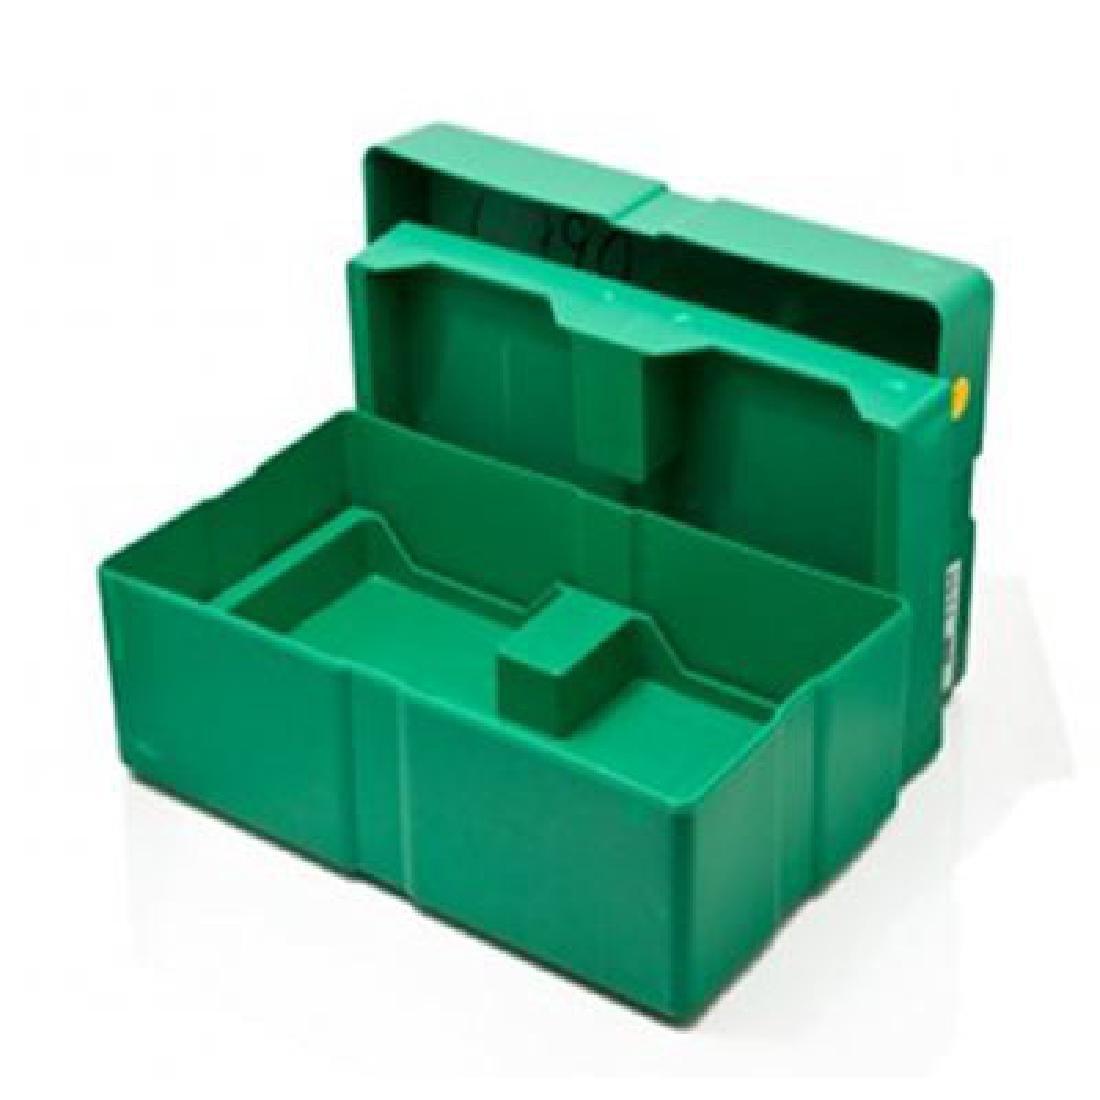 US Mint Silver Eagle Shipping Box w/ Insert Tray